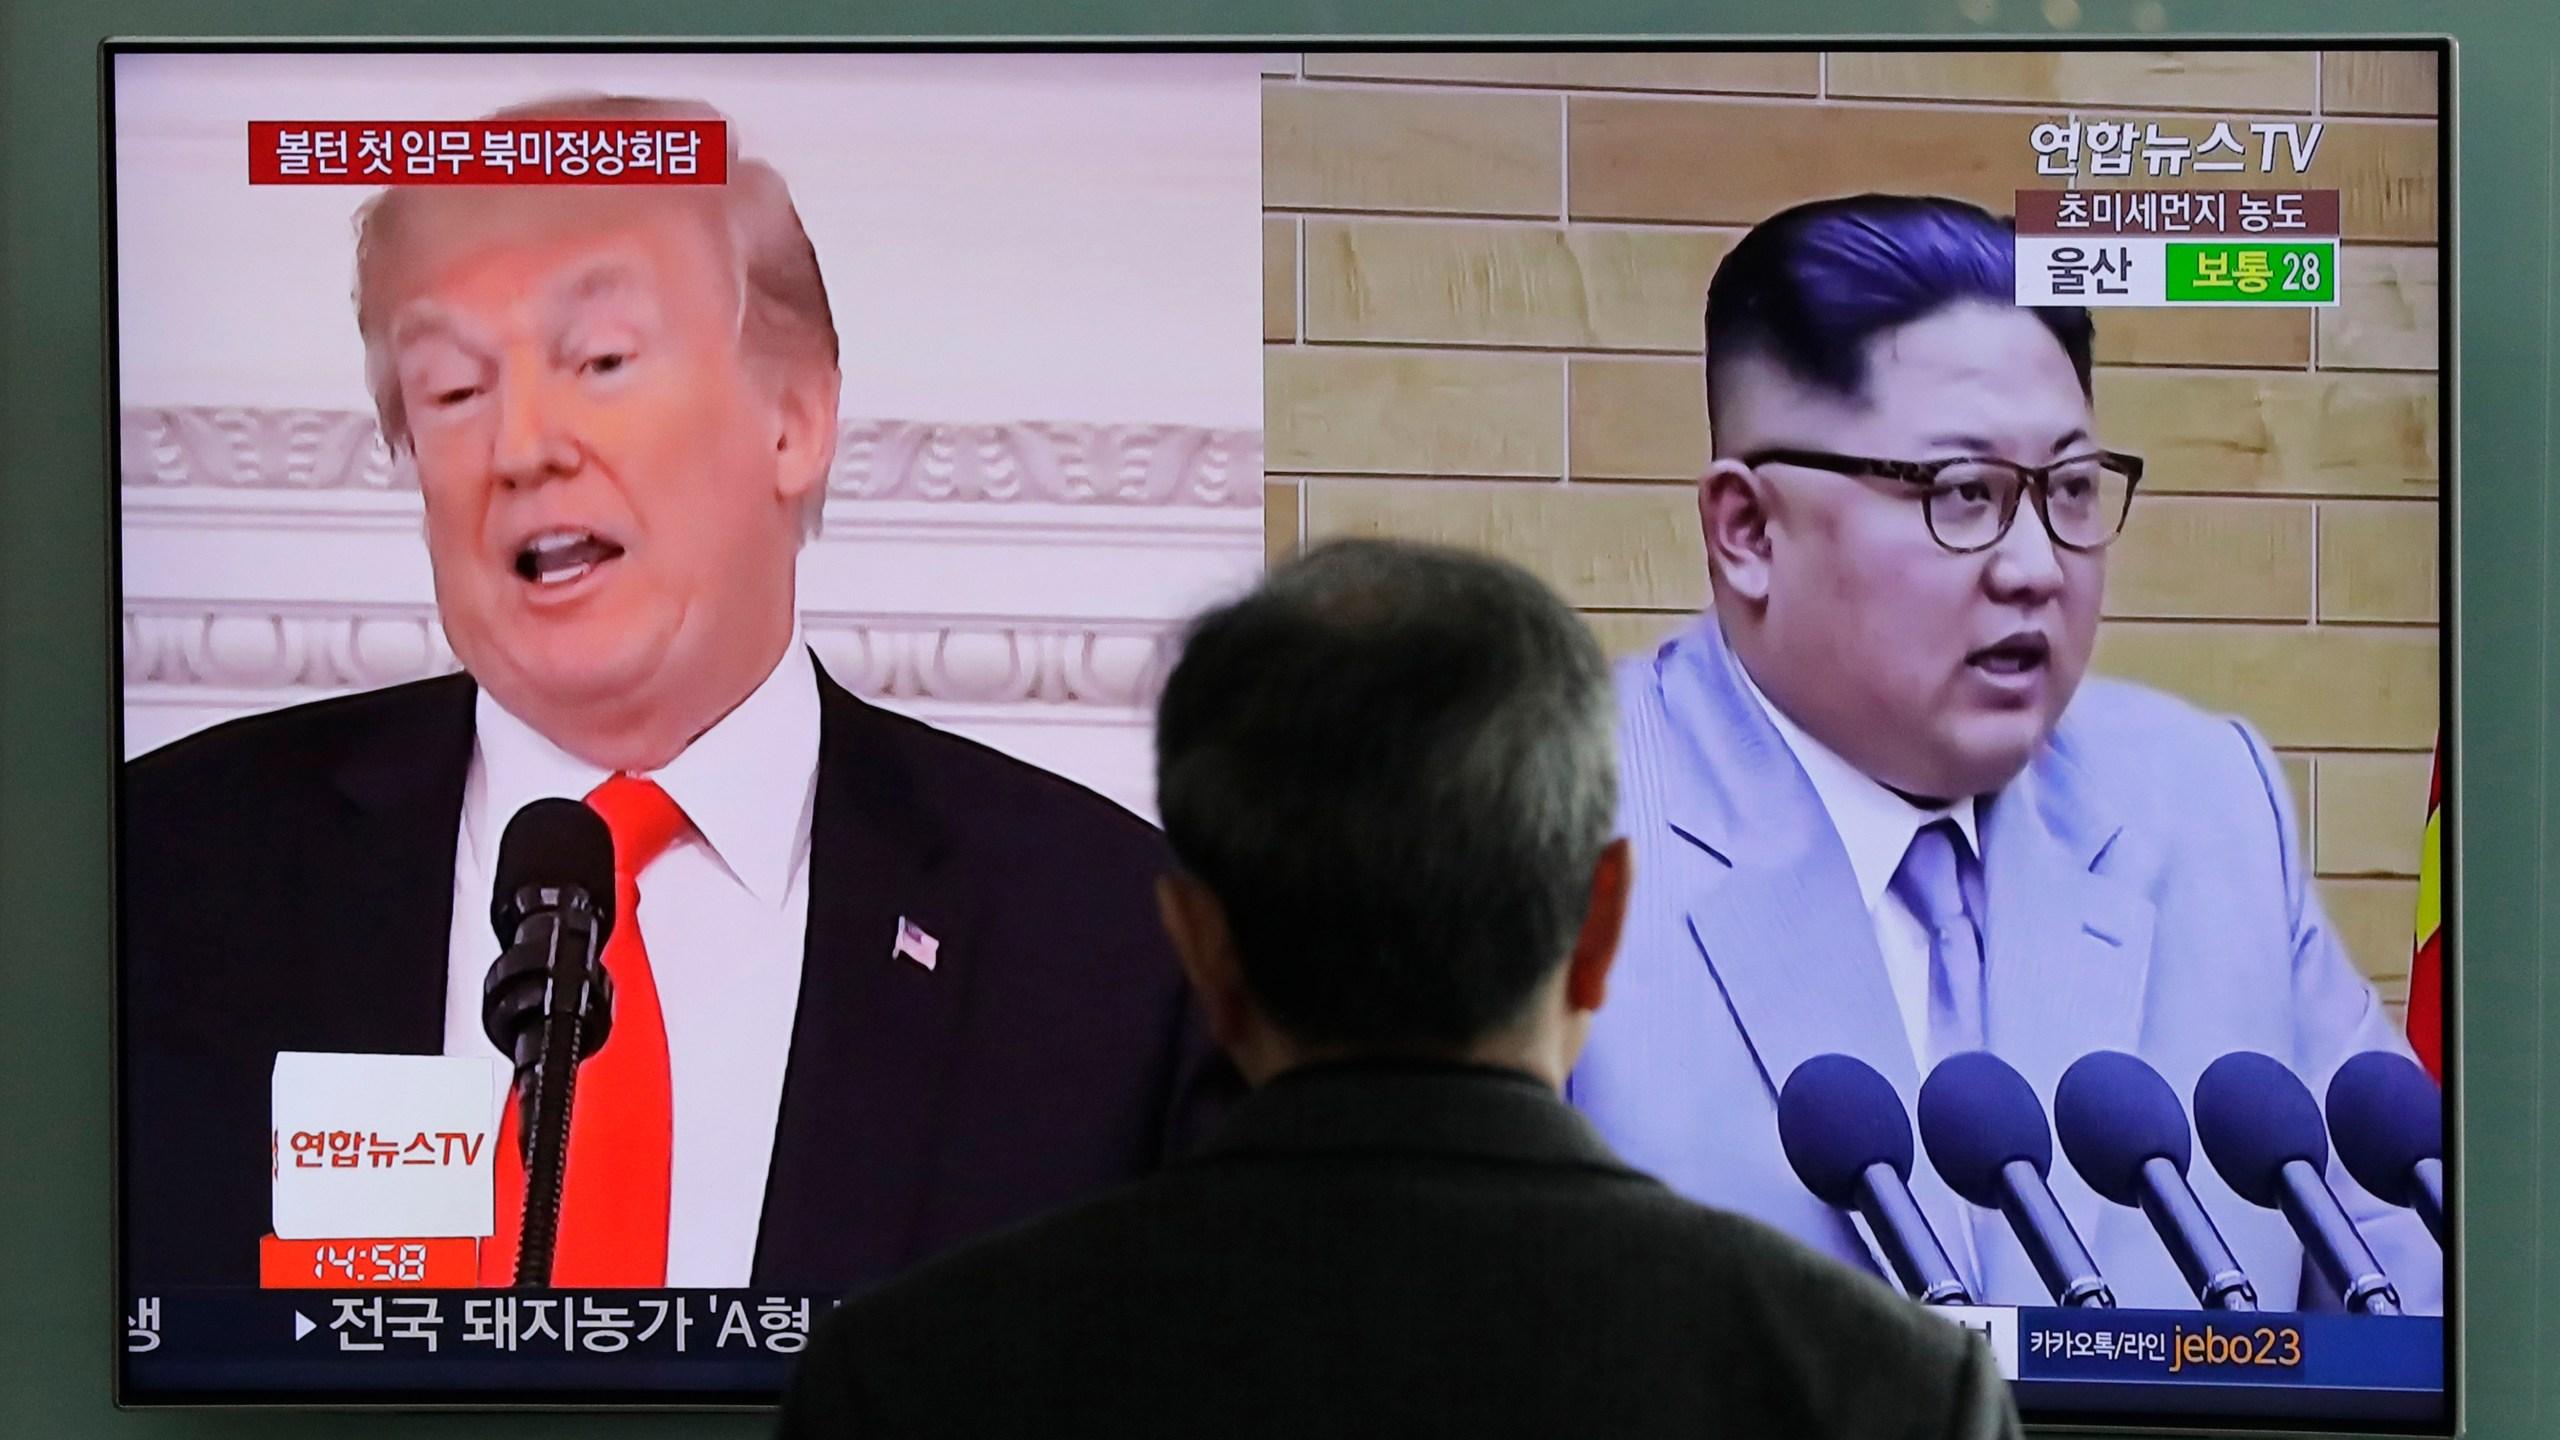 South_Korea_North_Korea_Nuclear_Site_20635-159532.jpg97785783